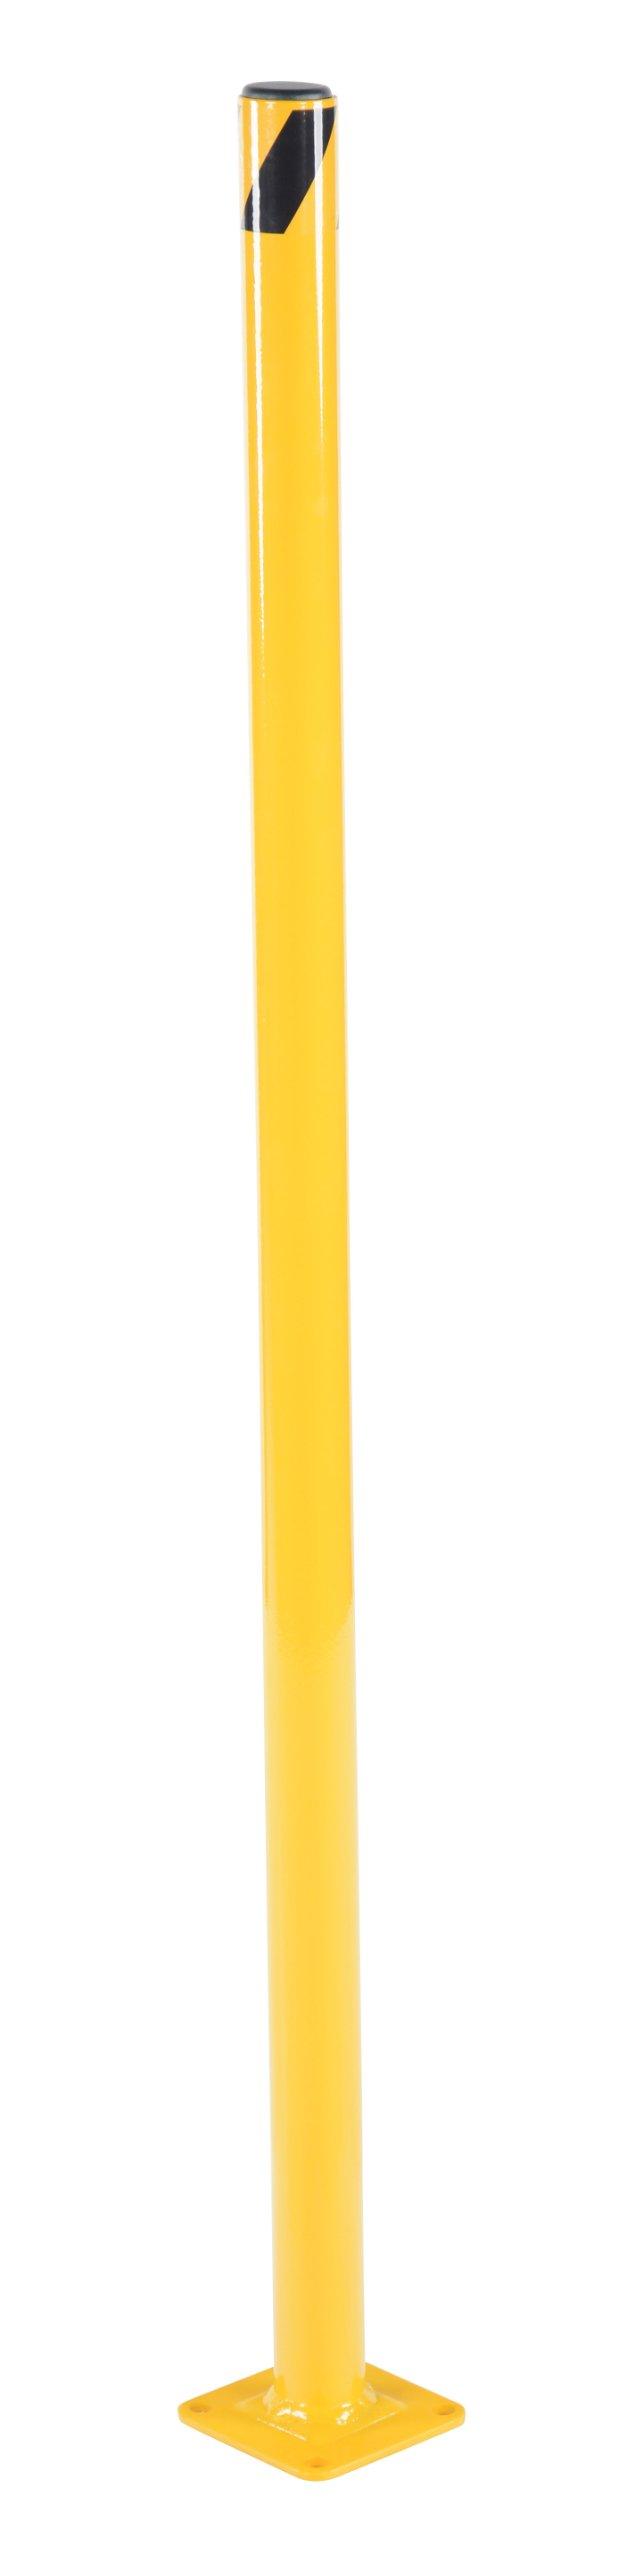 Vestil BOL-42-2 Yellow Powder Coat Pipe Safety Bollard, Steel, 1-3/4'' OD, 42'' Height